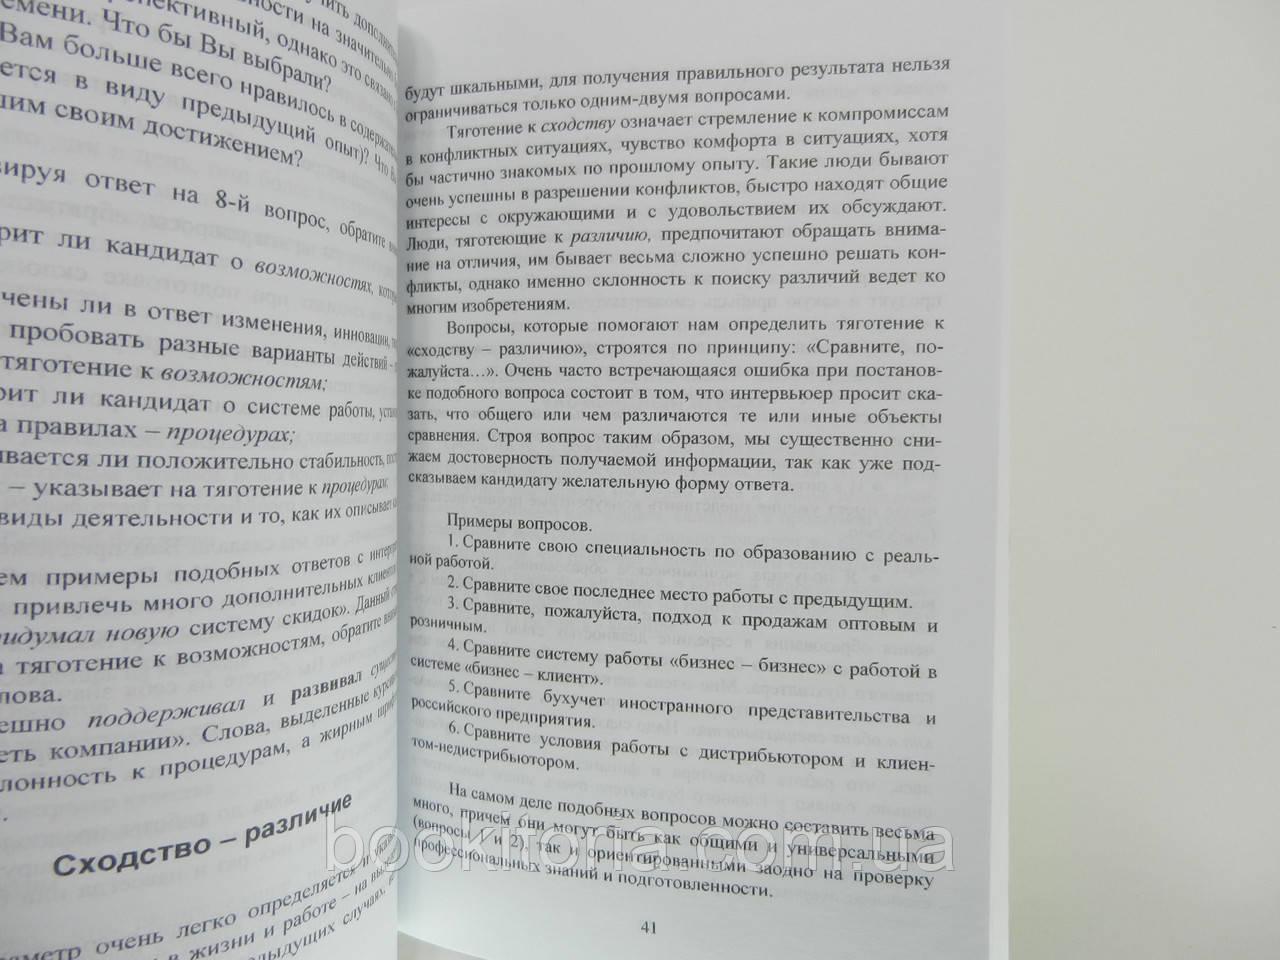 Иванова С. Искусство подбора персонала. - фото 6